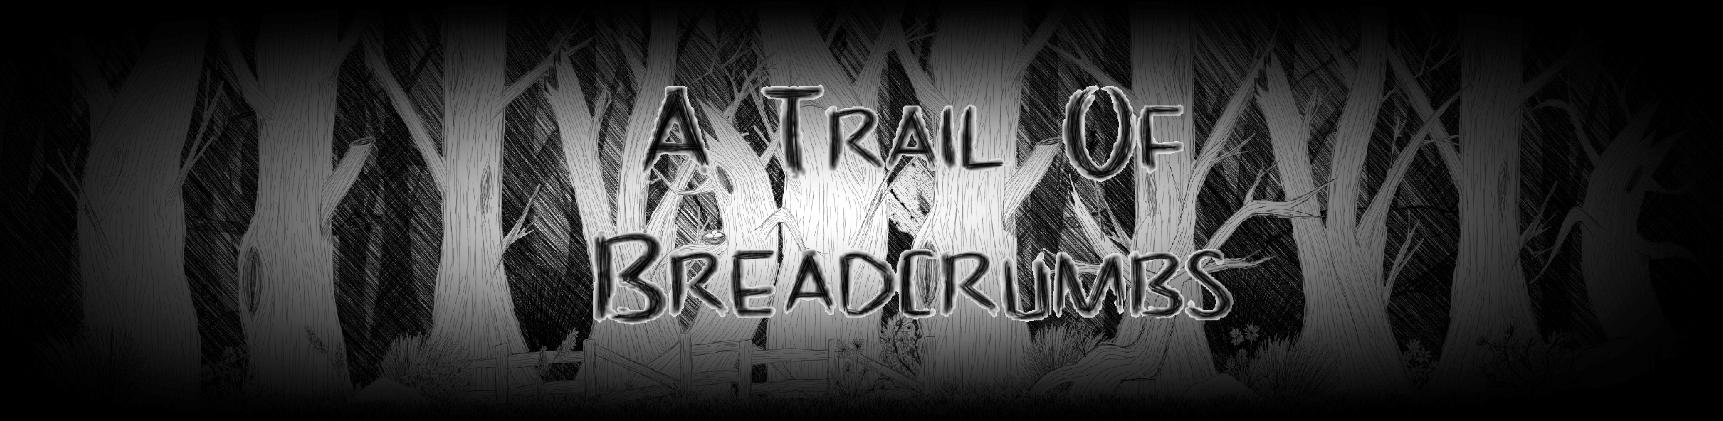 A Trail Of Breadcrumbs